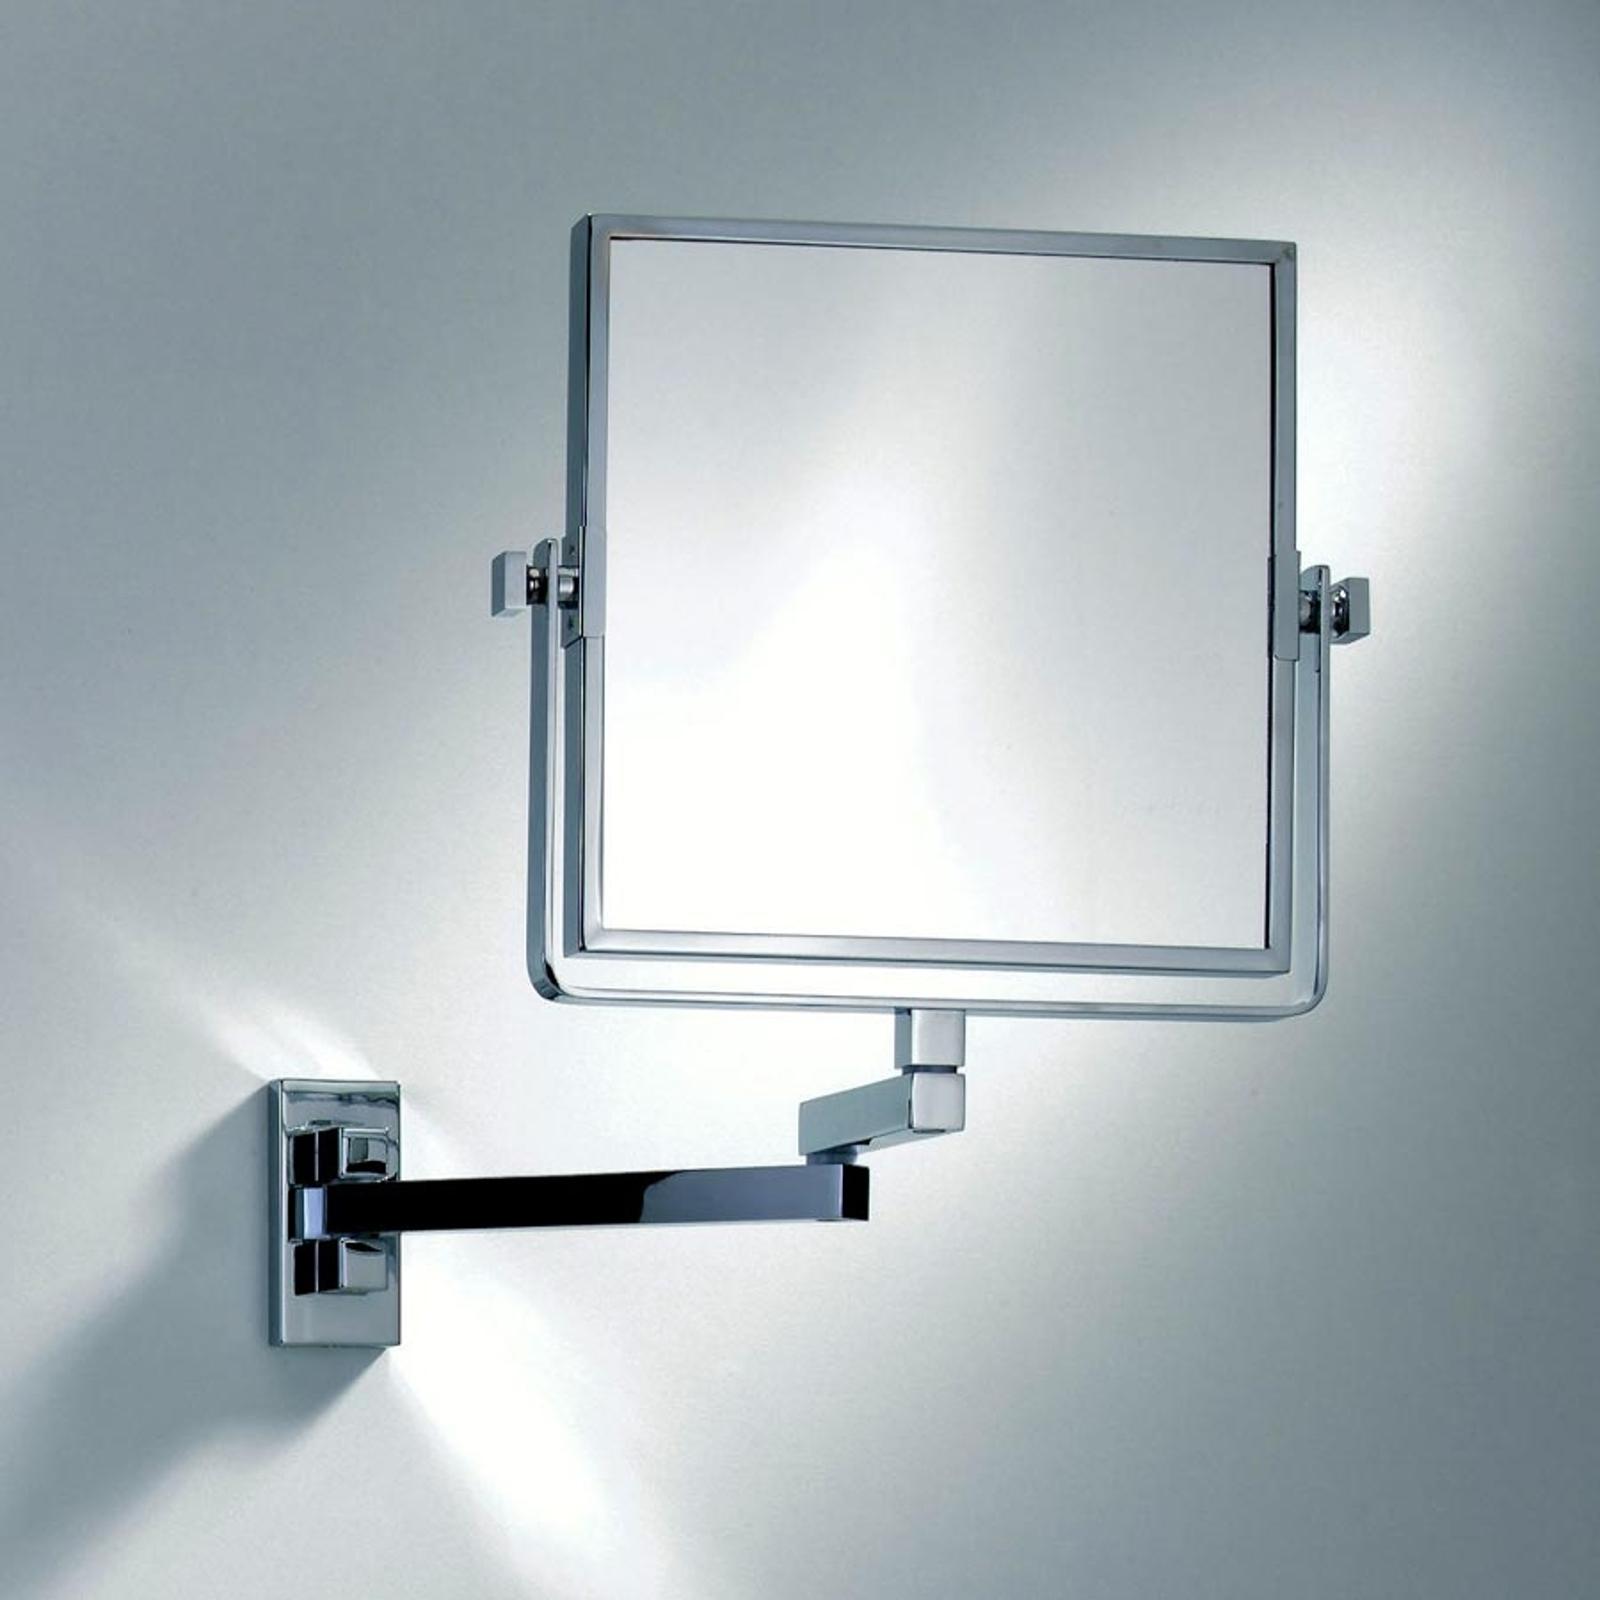 Decor Walther Edge nástenné kozmetické zrkadlo_2504208_1